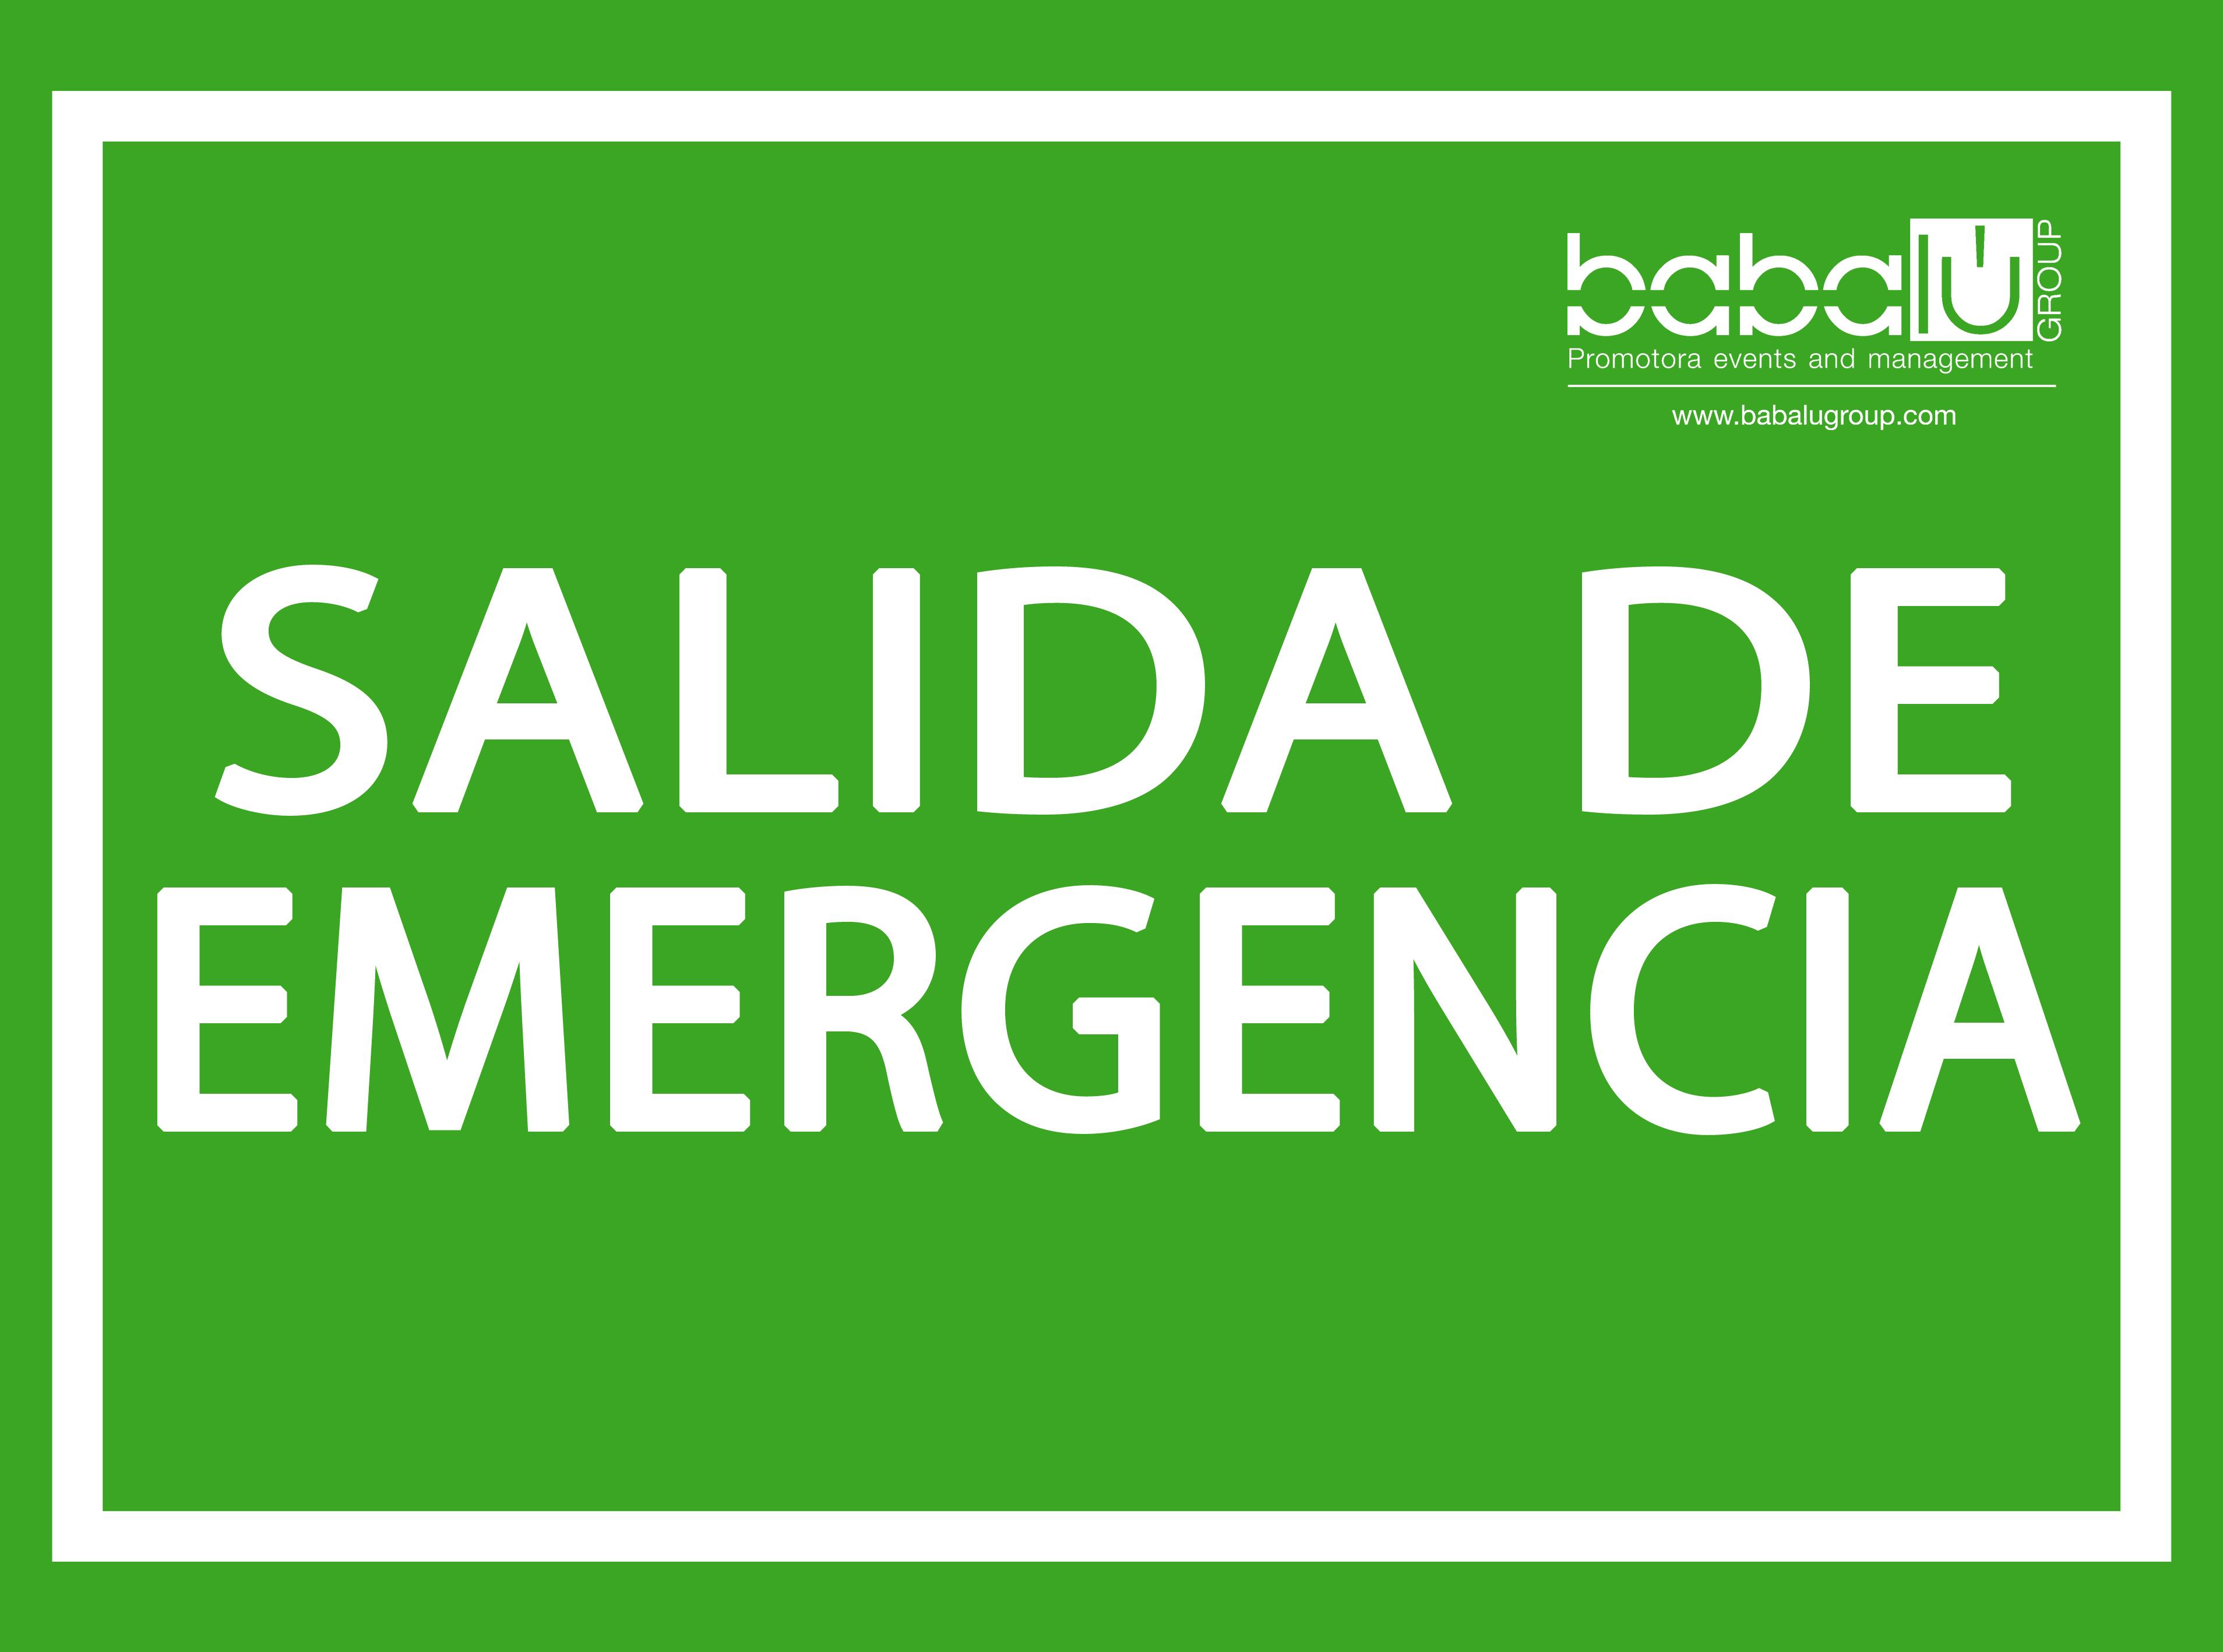 Salidas Emergencia Normativa Salida Emergencia